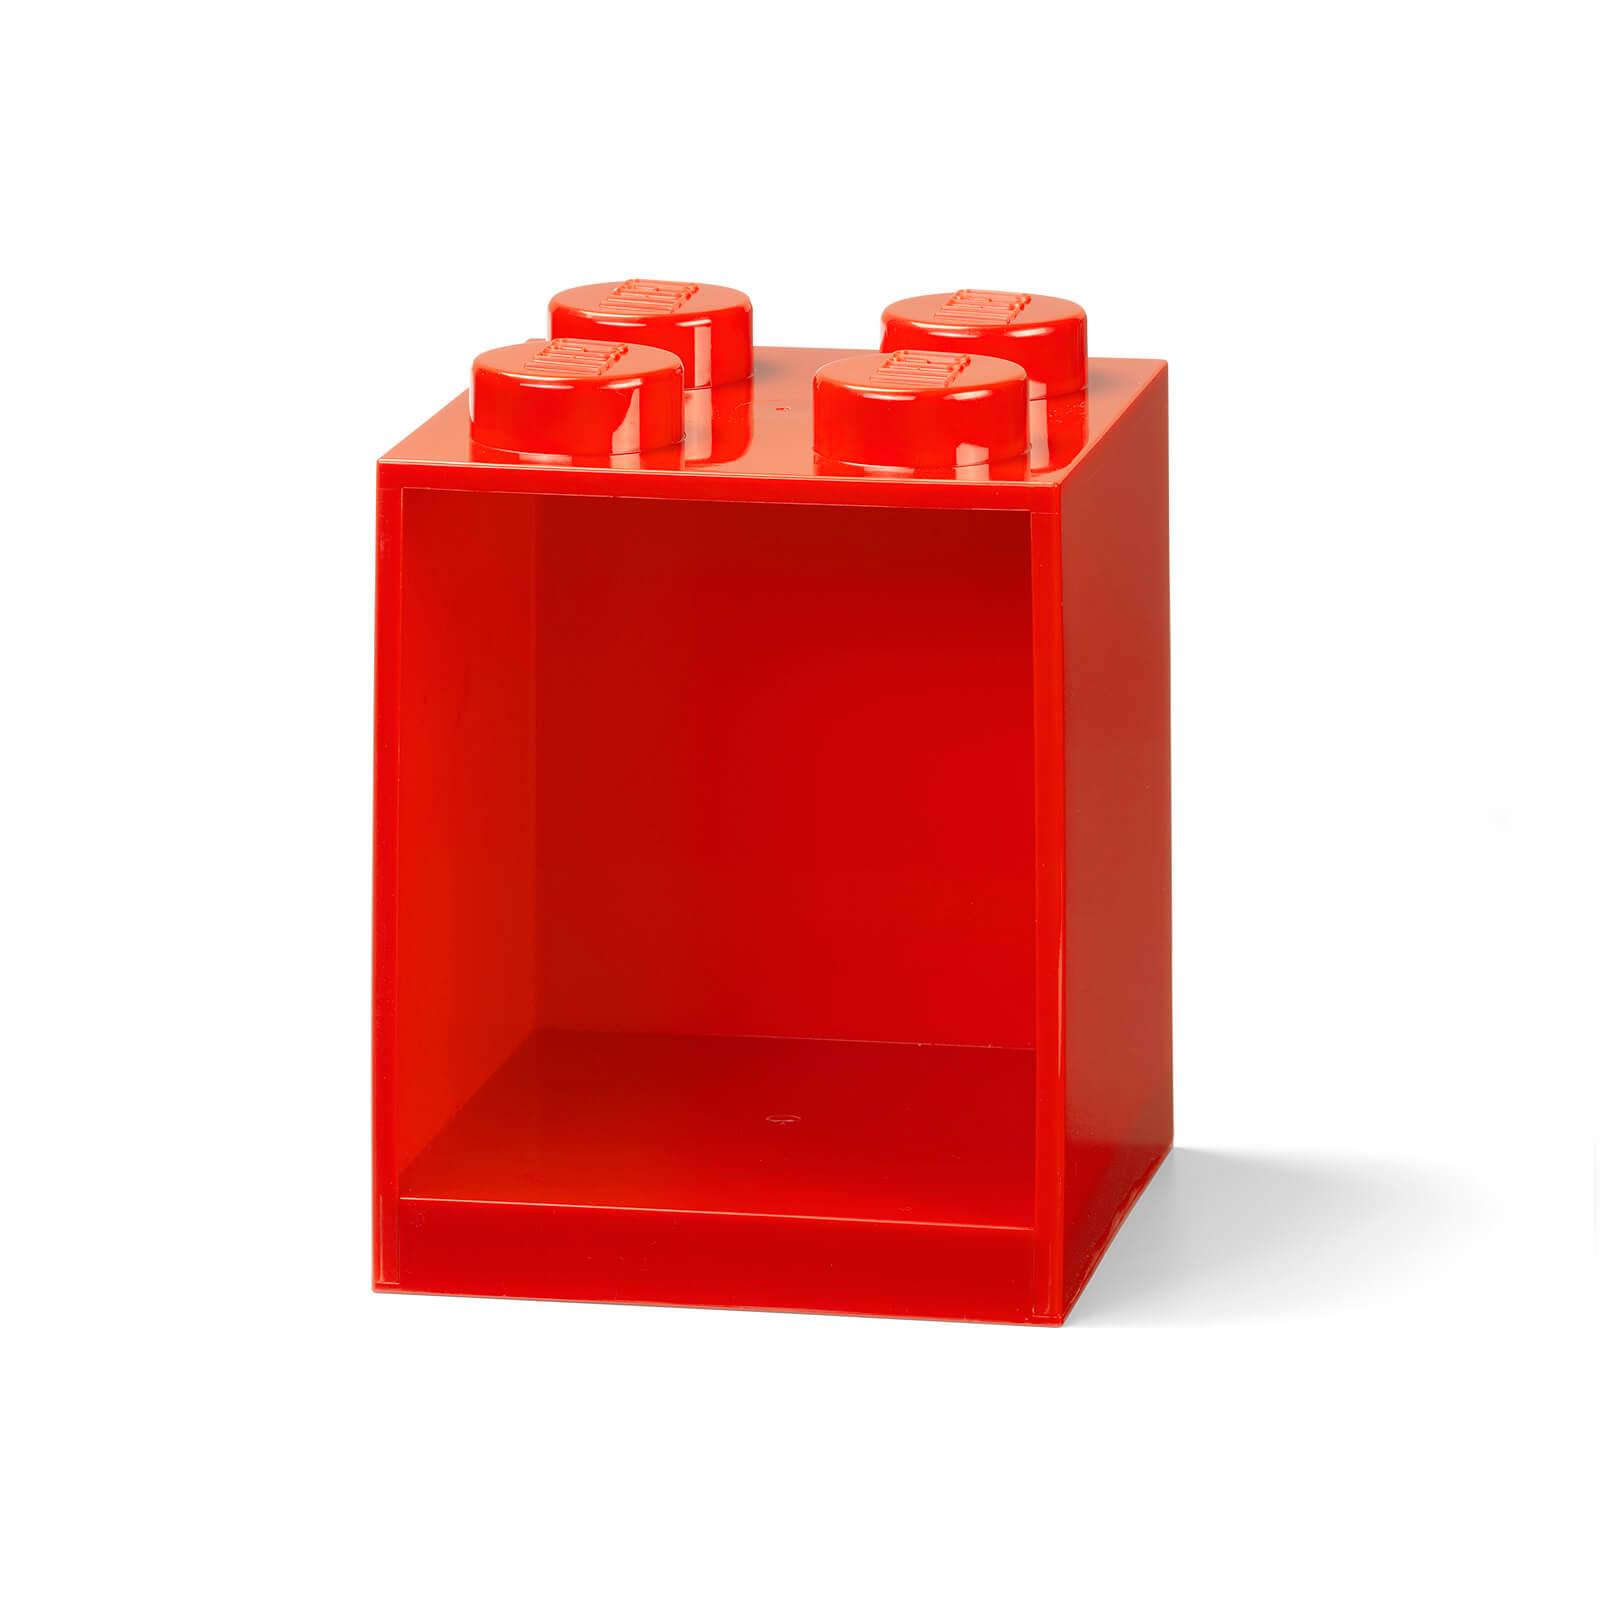 Image of LEGO Storage Brick Shelf 4 - Red